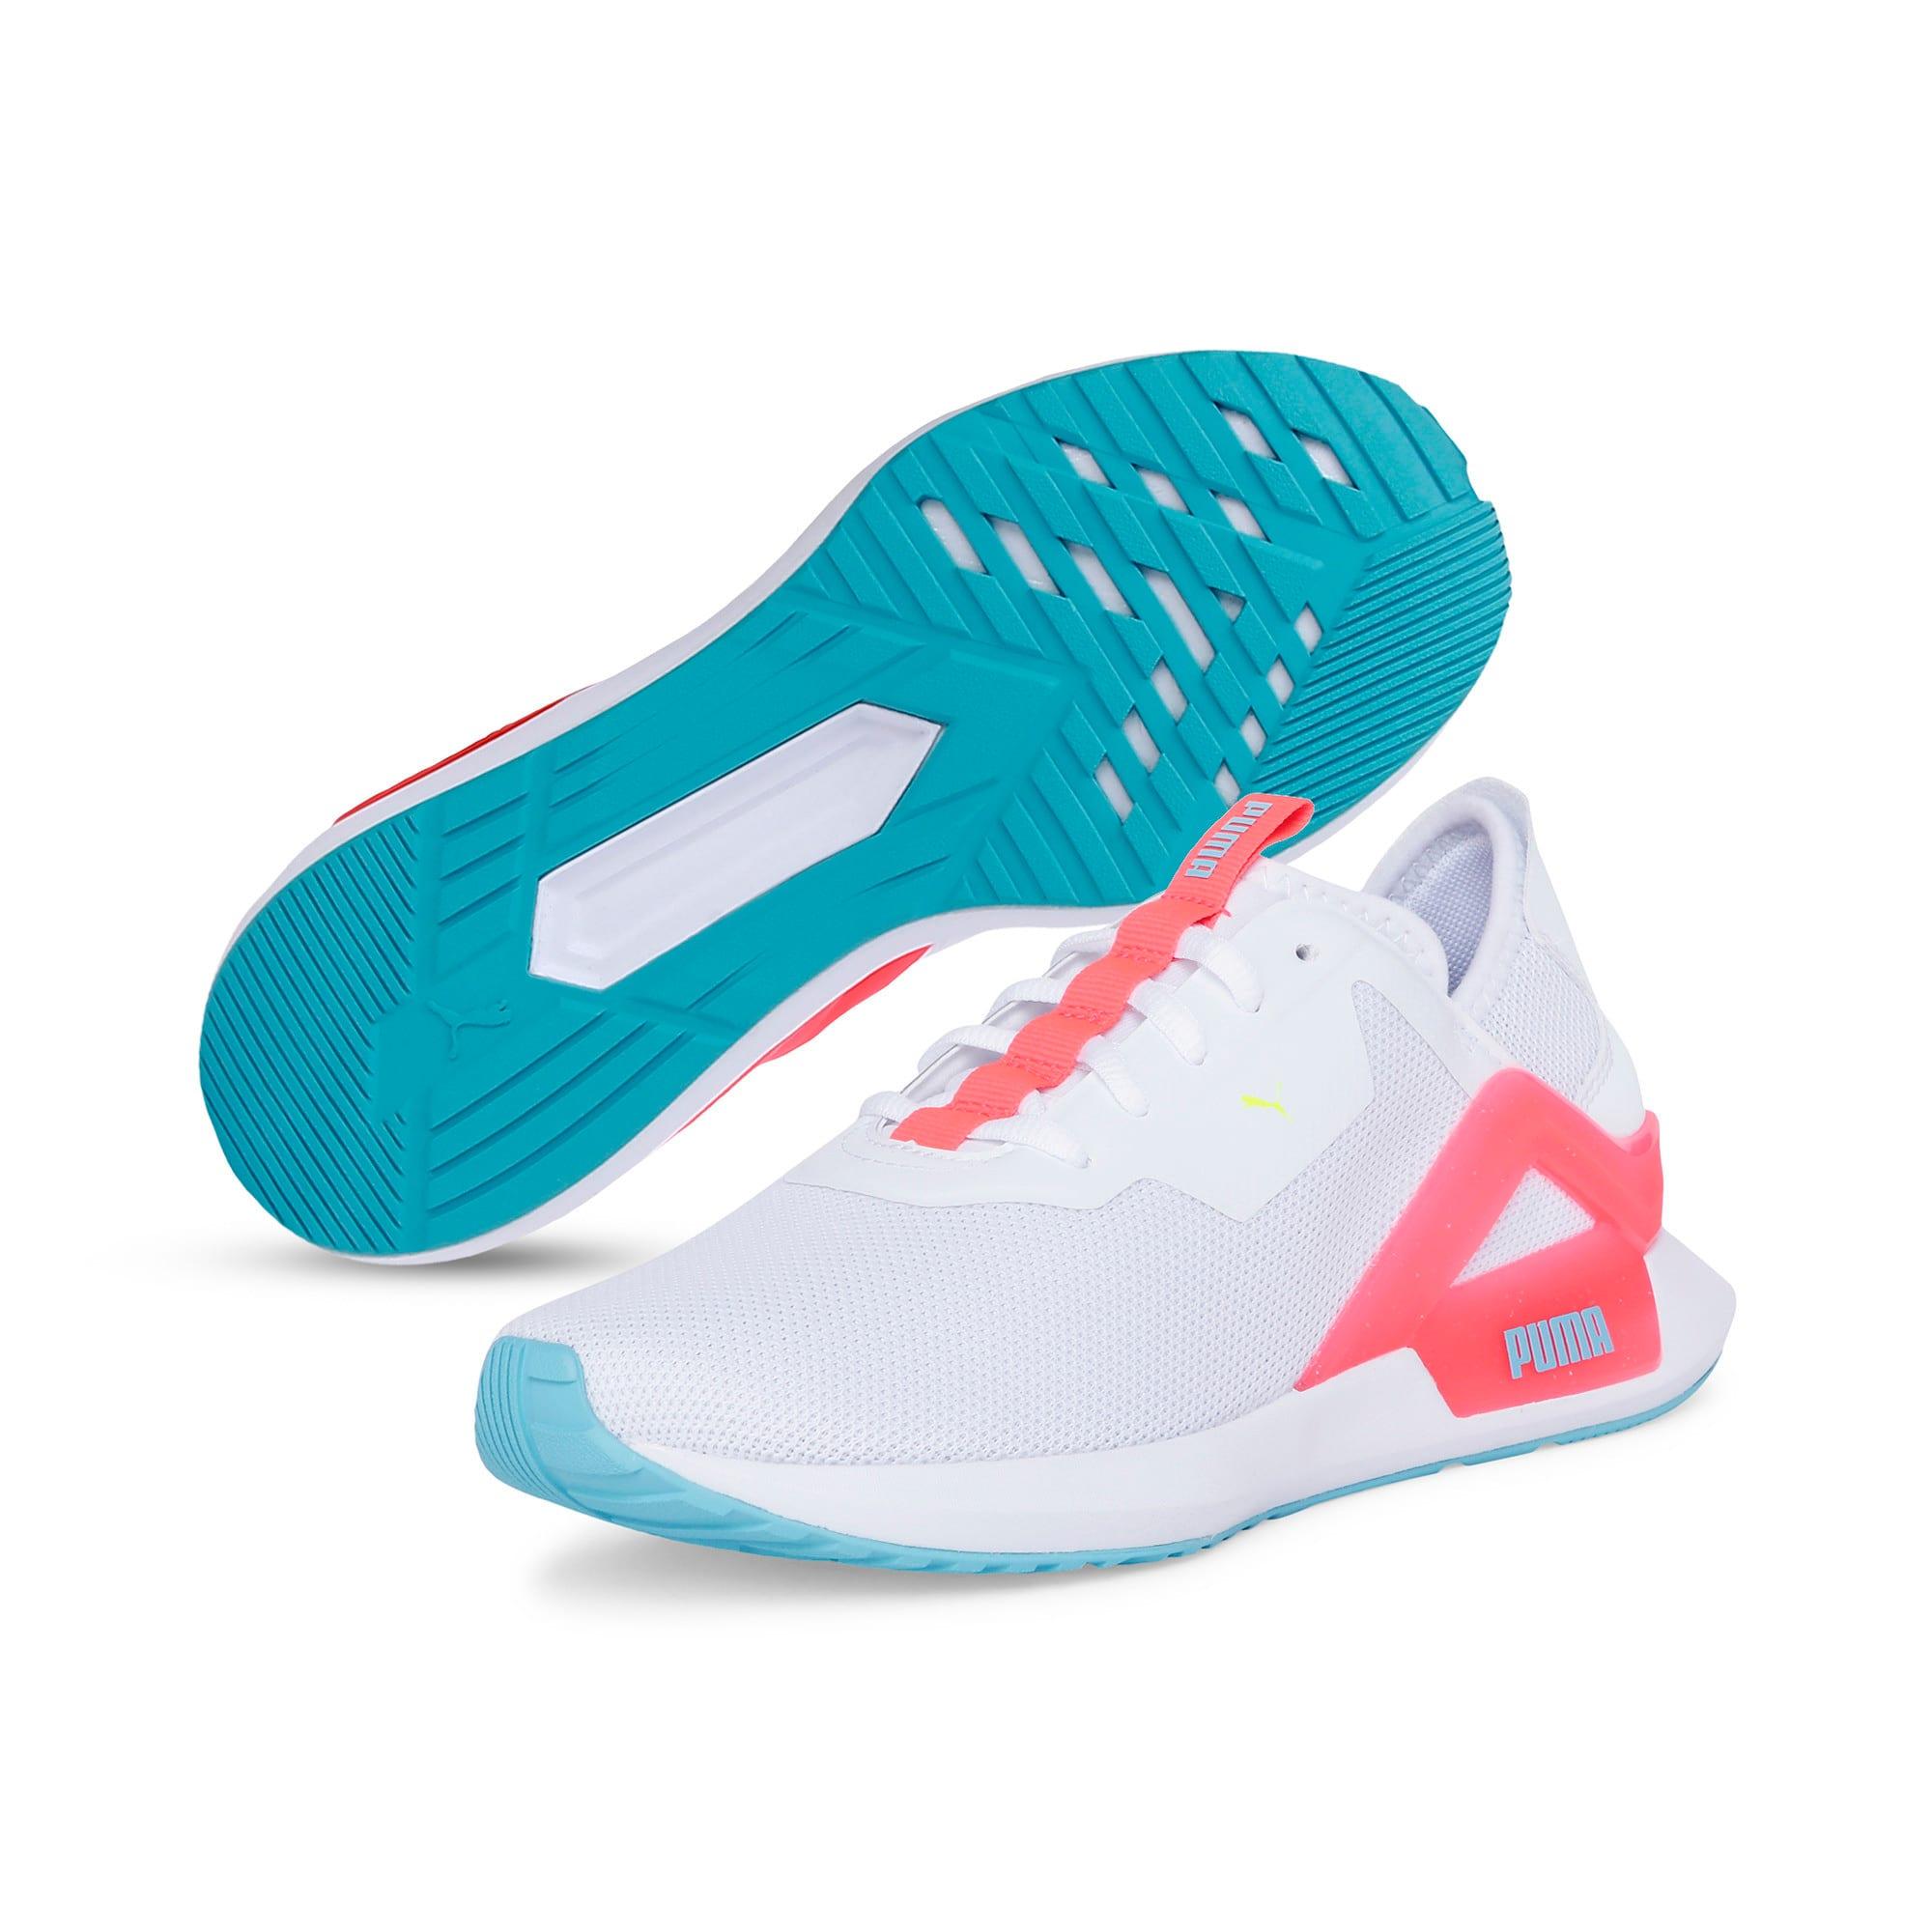 Thumbnail 4 of Rogue X Knit Women's Running Shoes, Puma White-Pink Alert, medium-IND